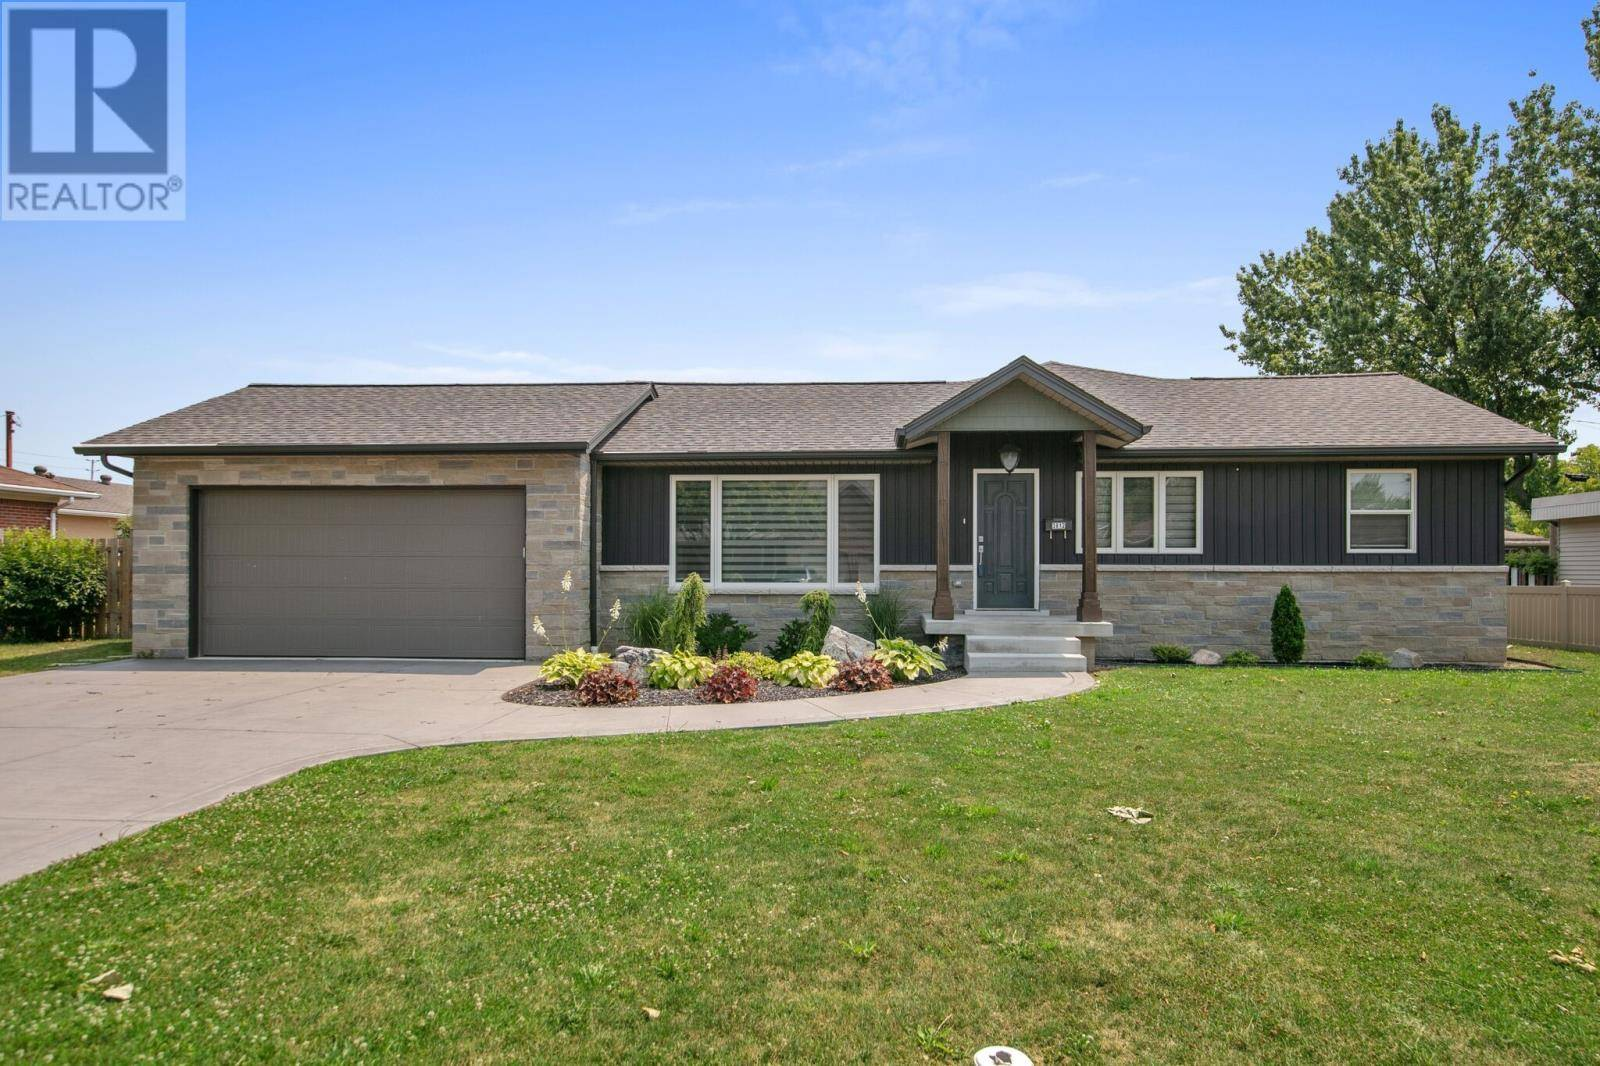 House for sale at 3812 Karen St Windsor Ontario - MLS: 19025225